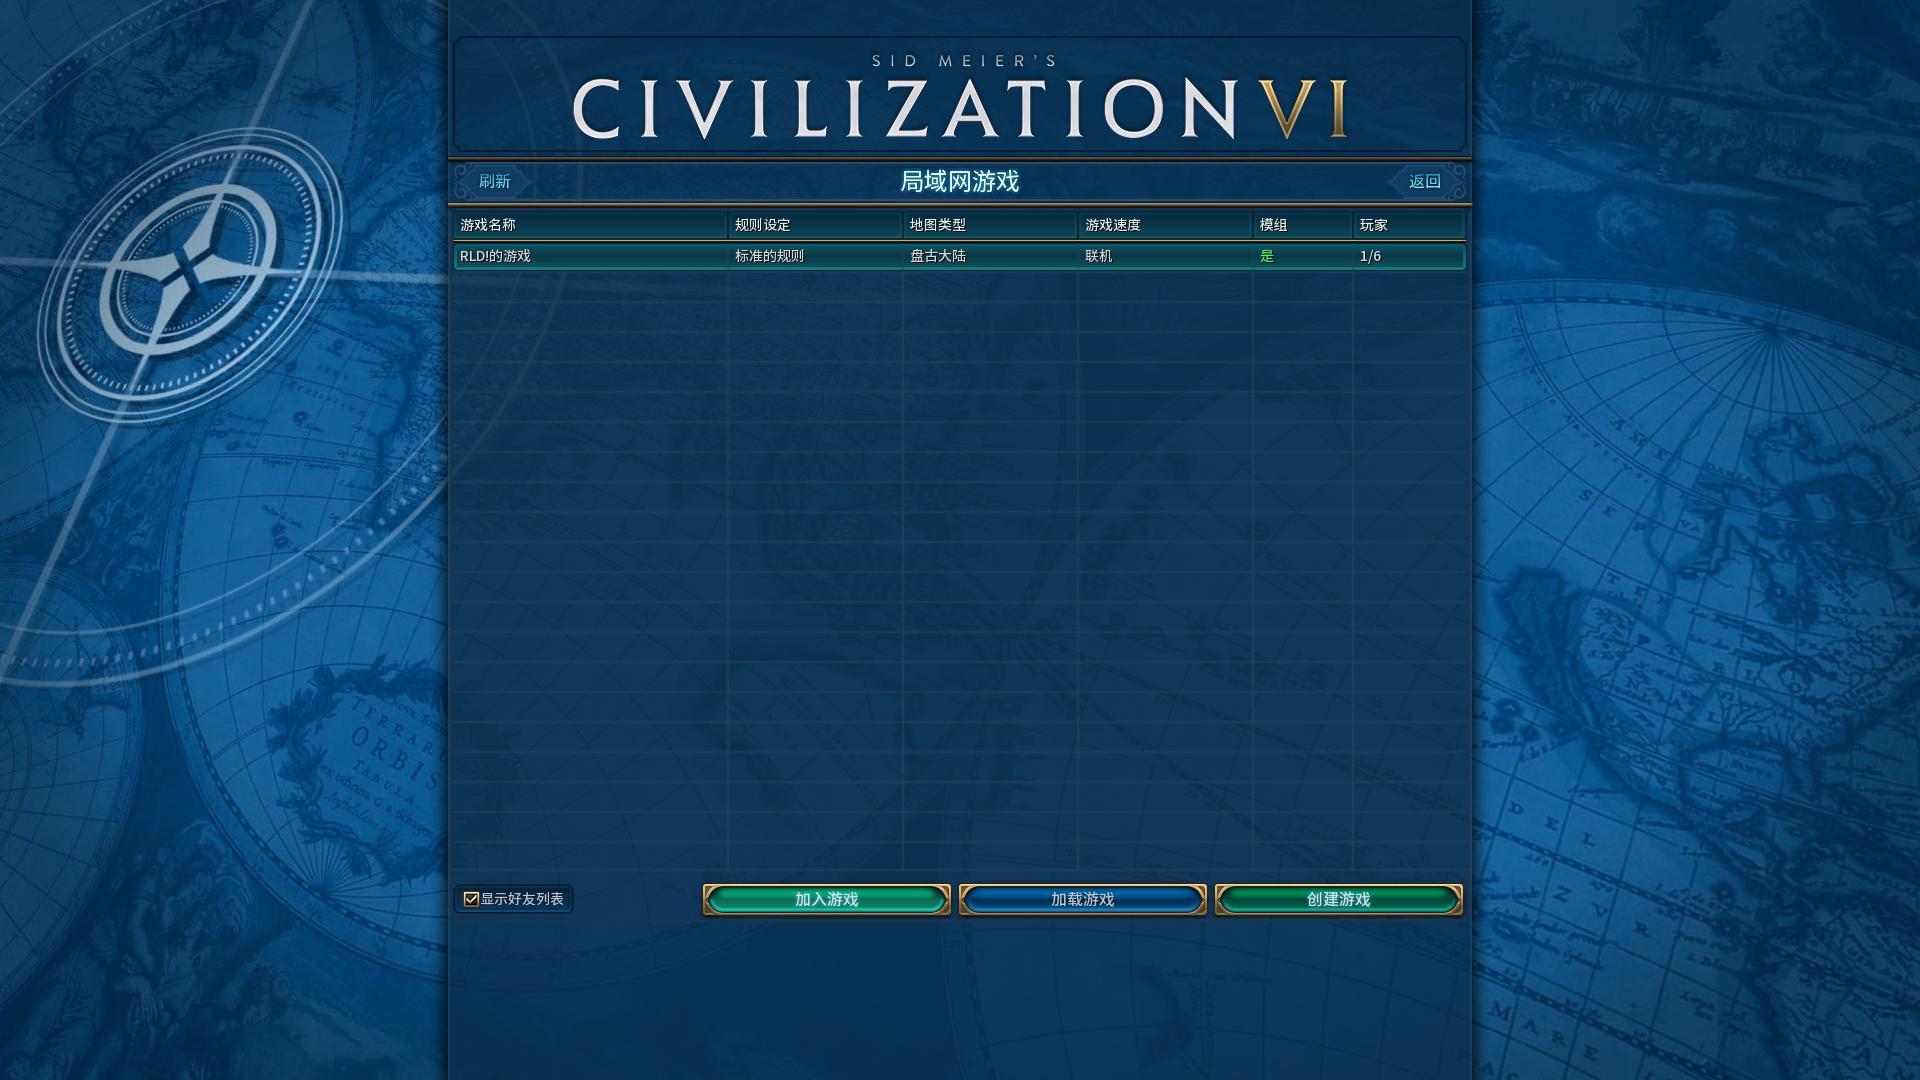 CivilizationVI 2016-10-21 15-10-33-45.jpg